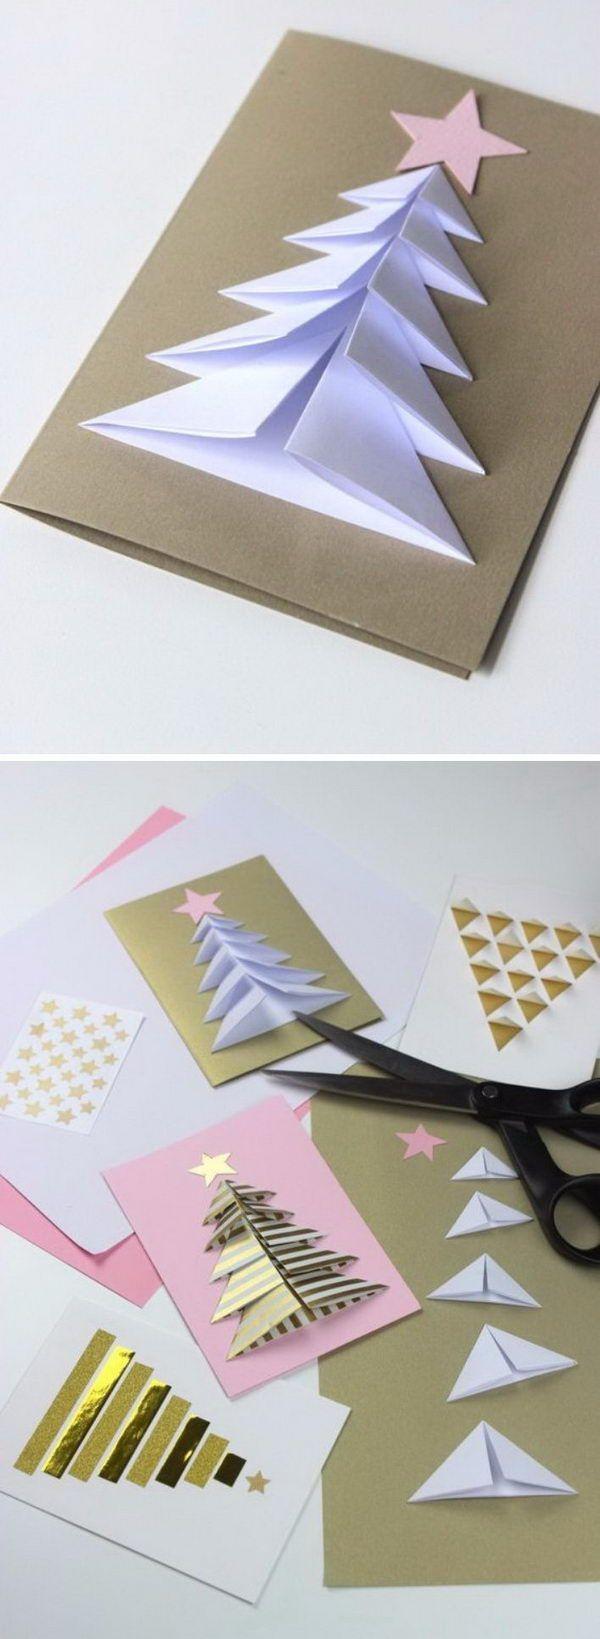 20+ Handmade Christmas Card Ideas | Crafts - Christmas Cards ...